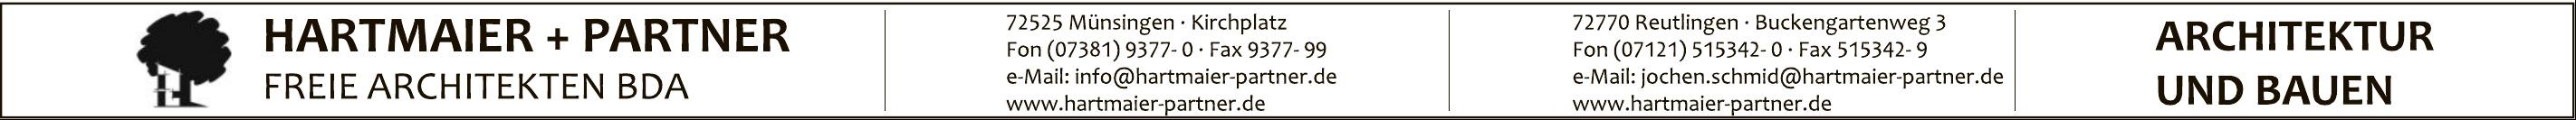 Hartmaier + Partner Freie Architekten BDA